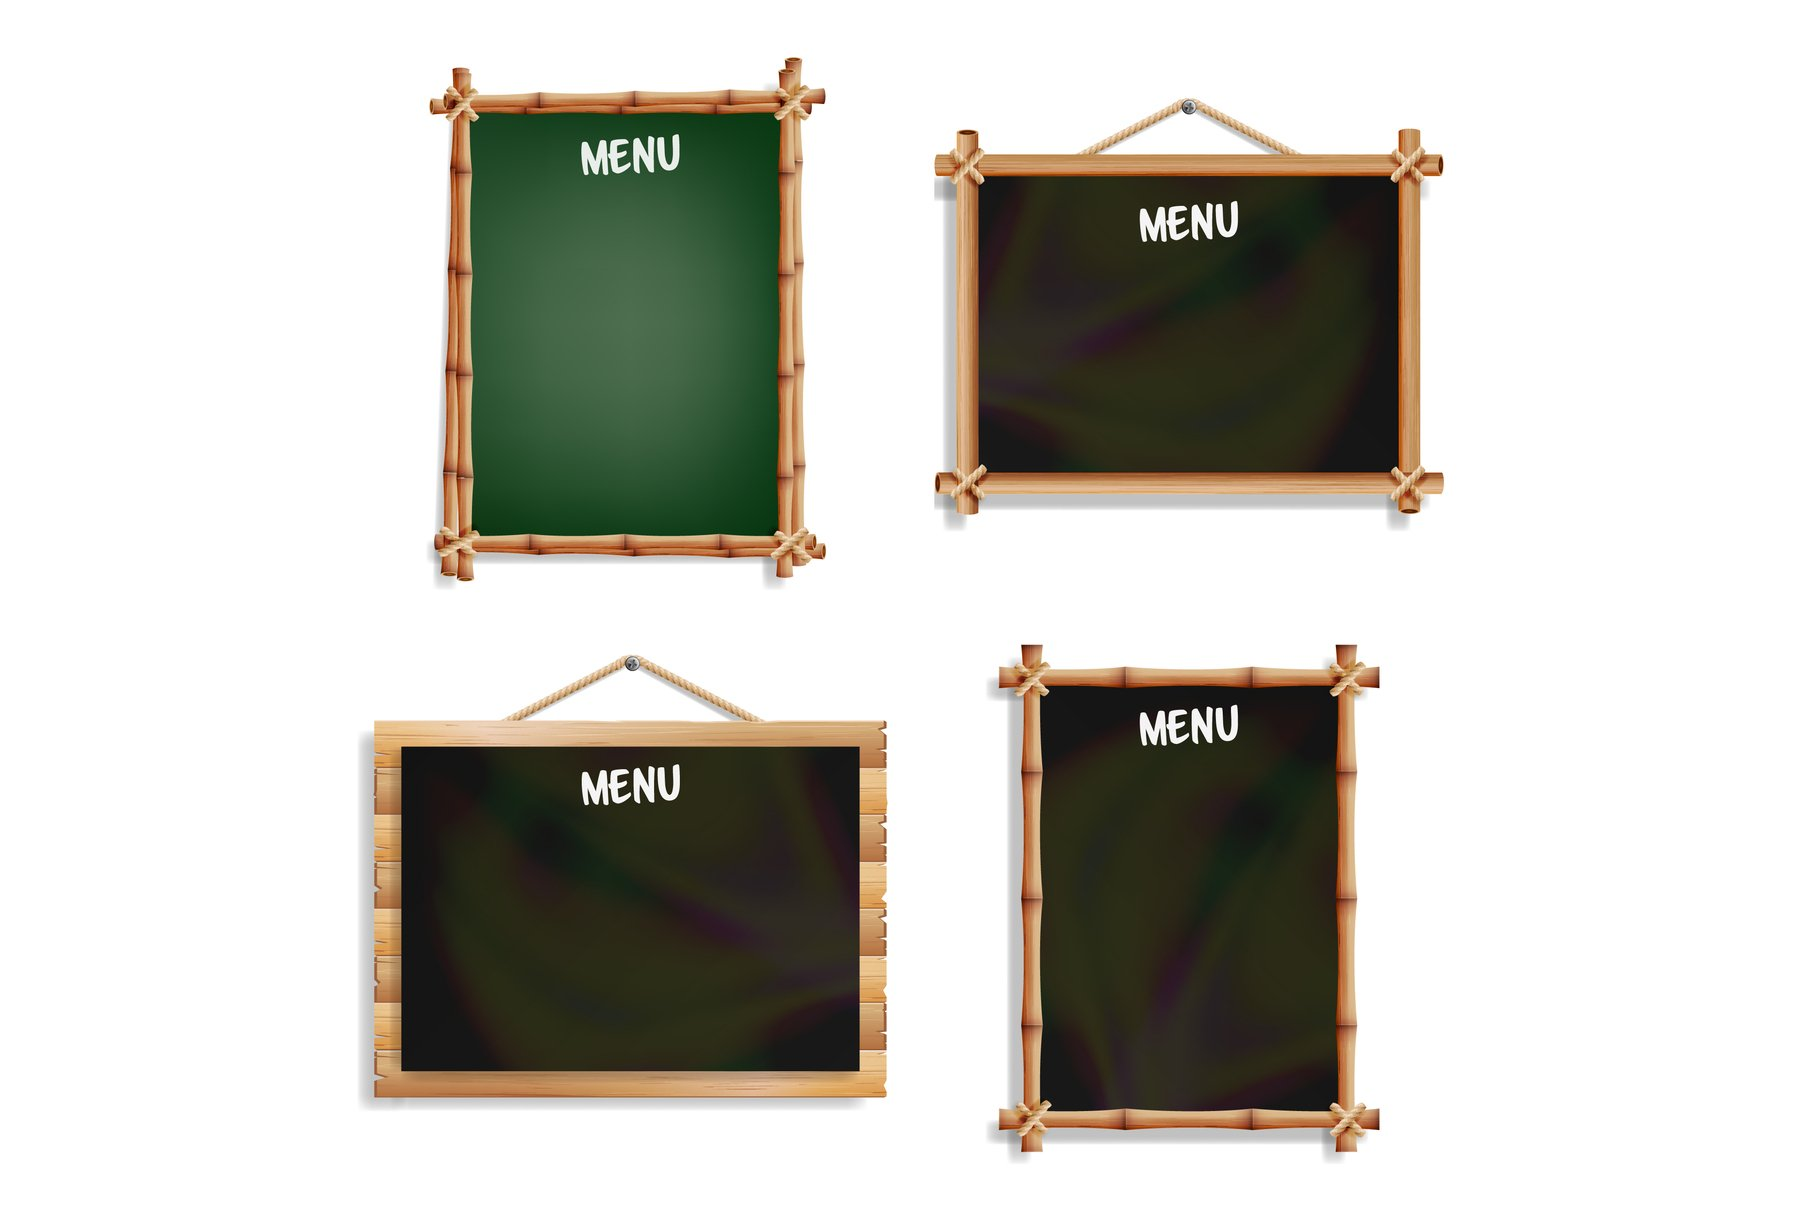 Restaurant Menu Boards Set. Isolated On White Background. example image 1